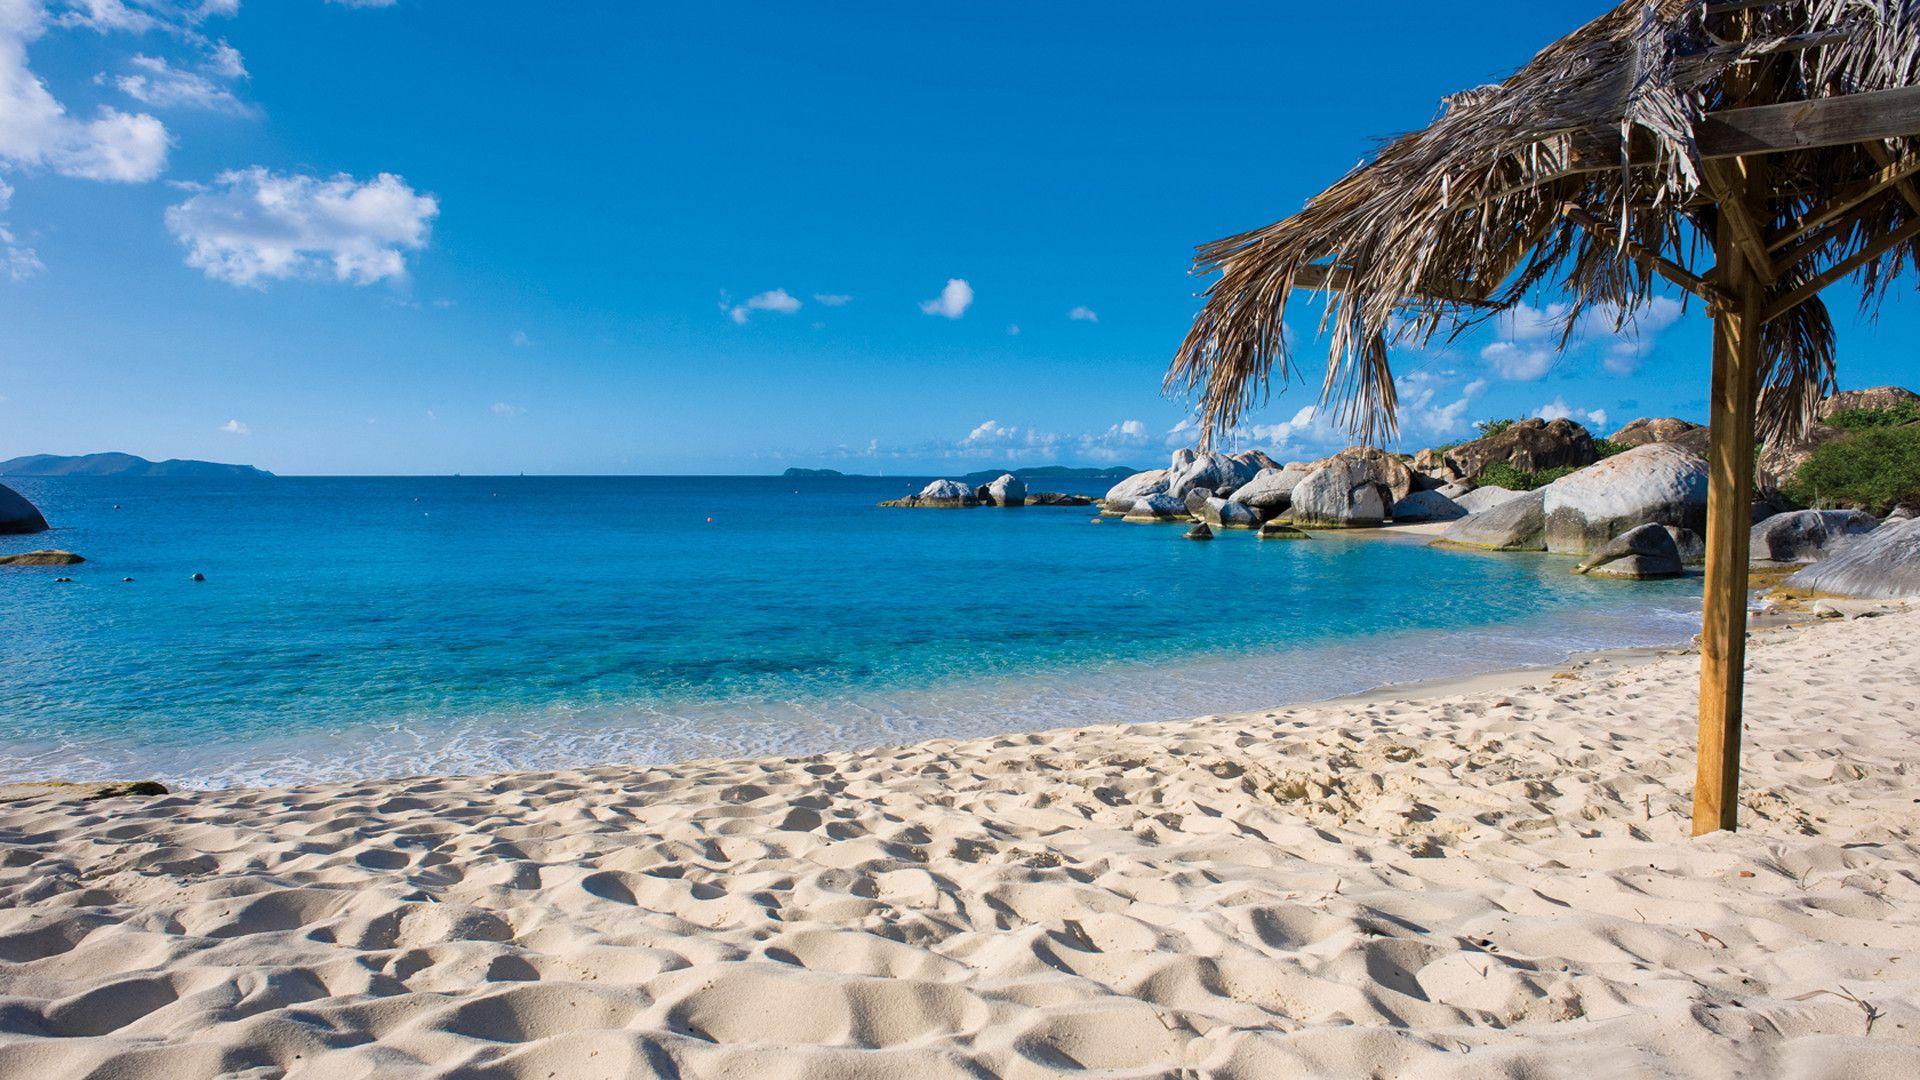 Mexican Beach Desktop Wallpapers Top Free Mexican Beach Desktop Backgrounds Wallpaperaccess